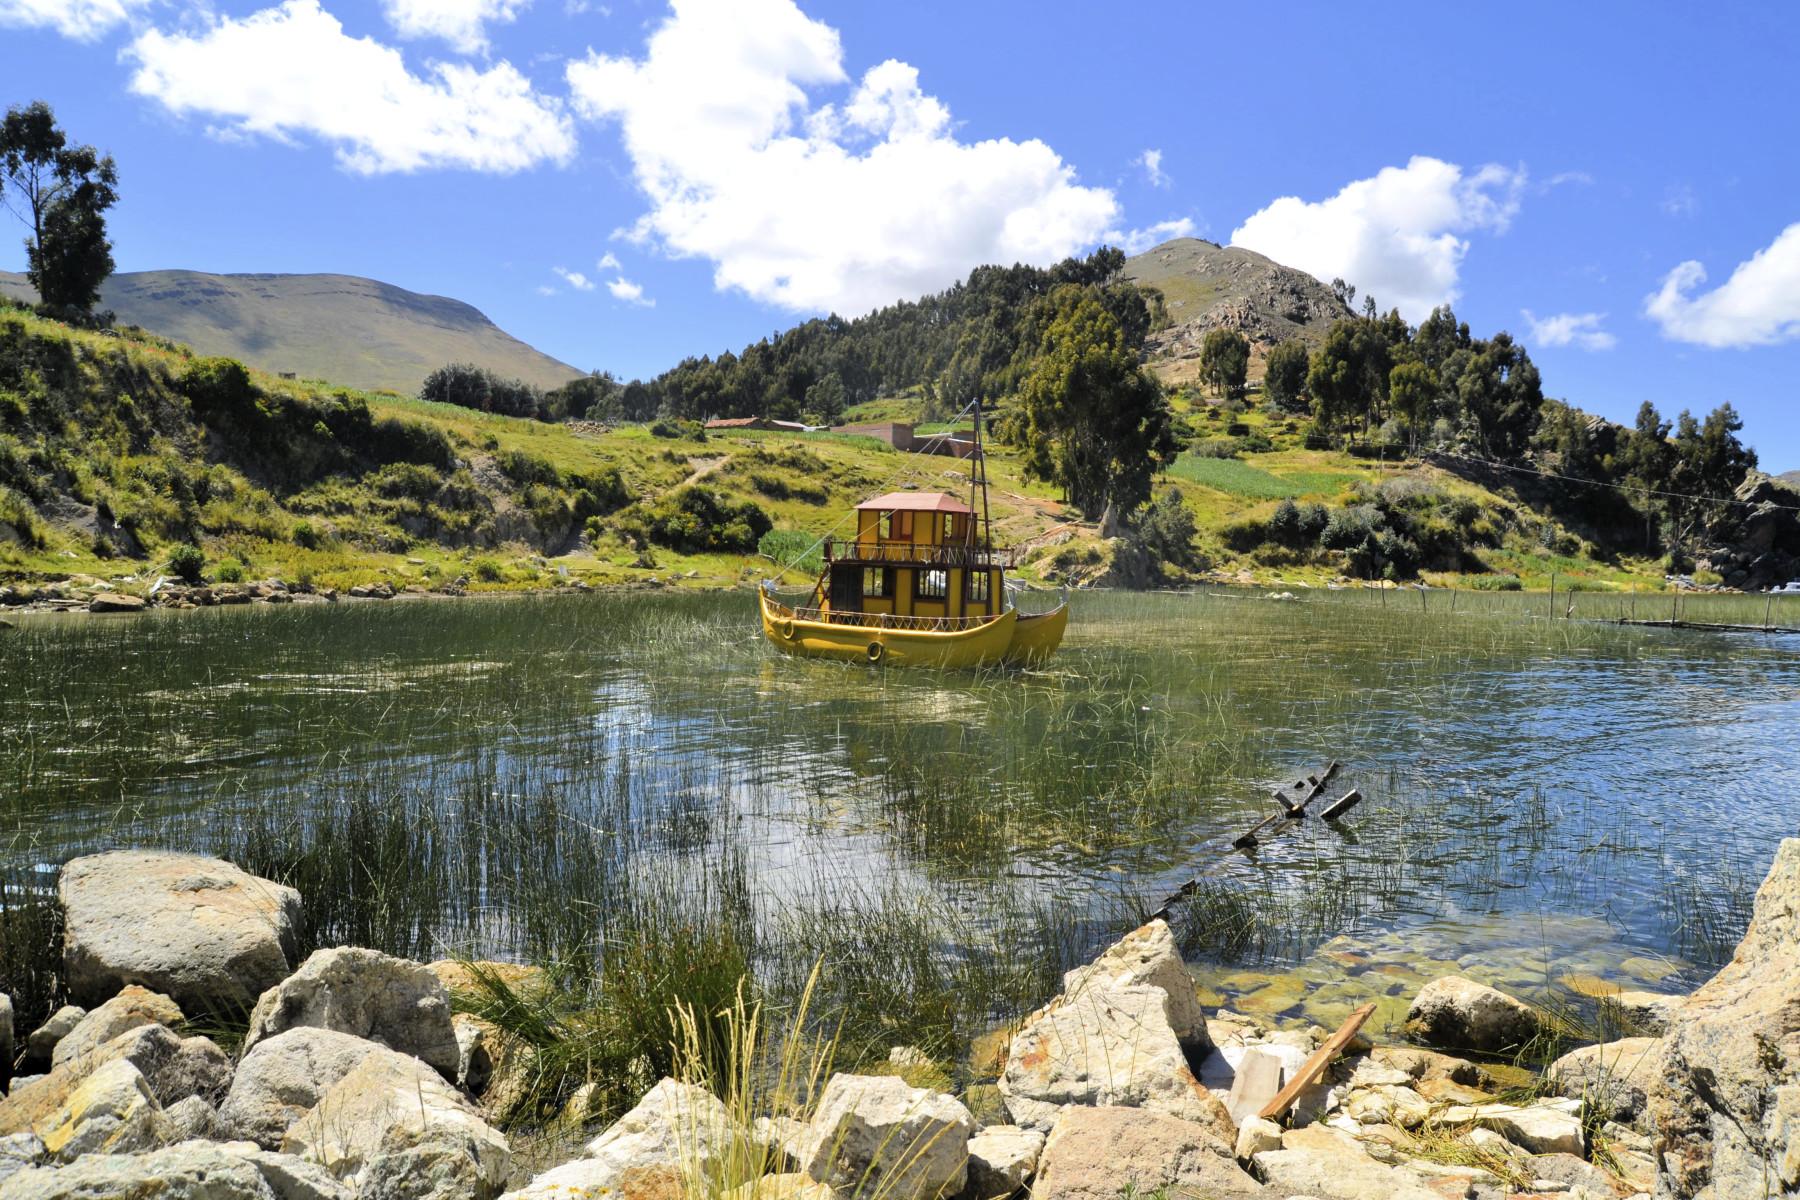 Titicaca lake reed boat